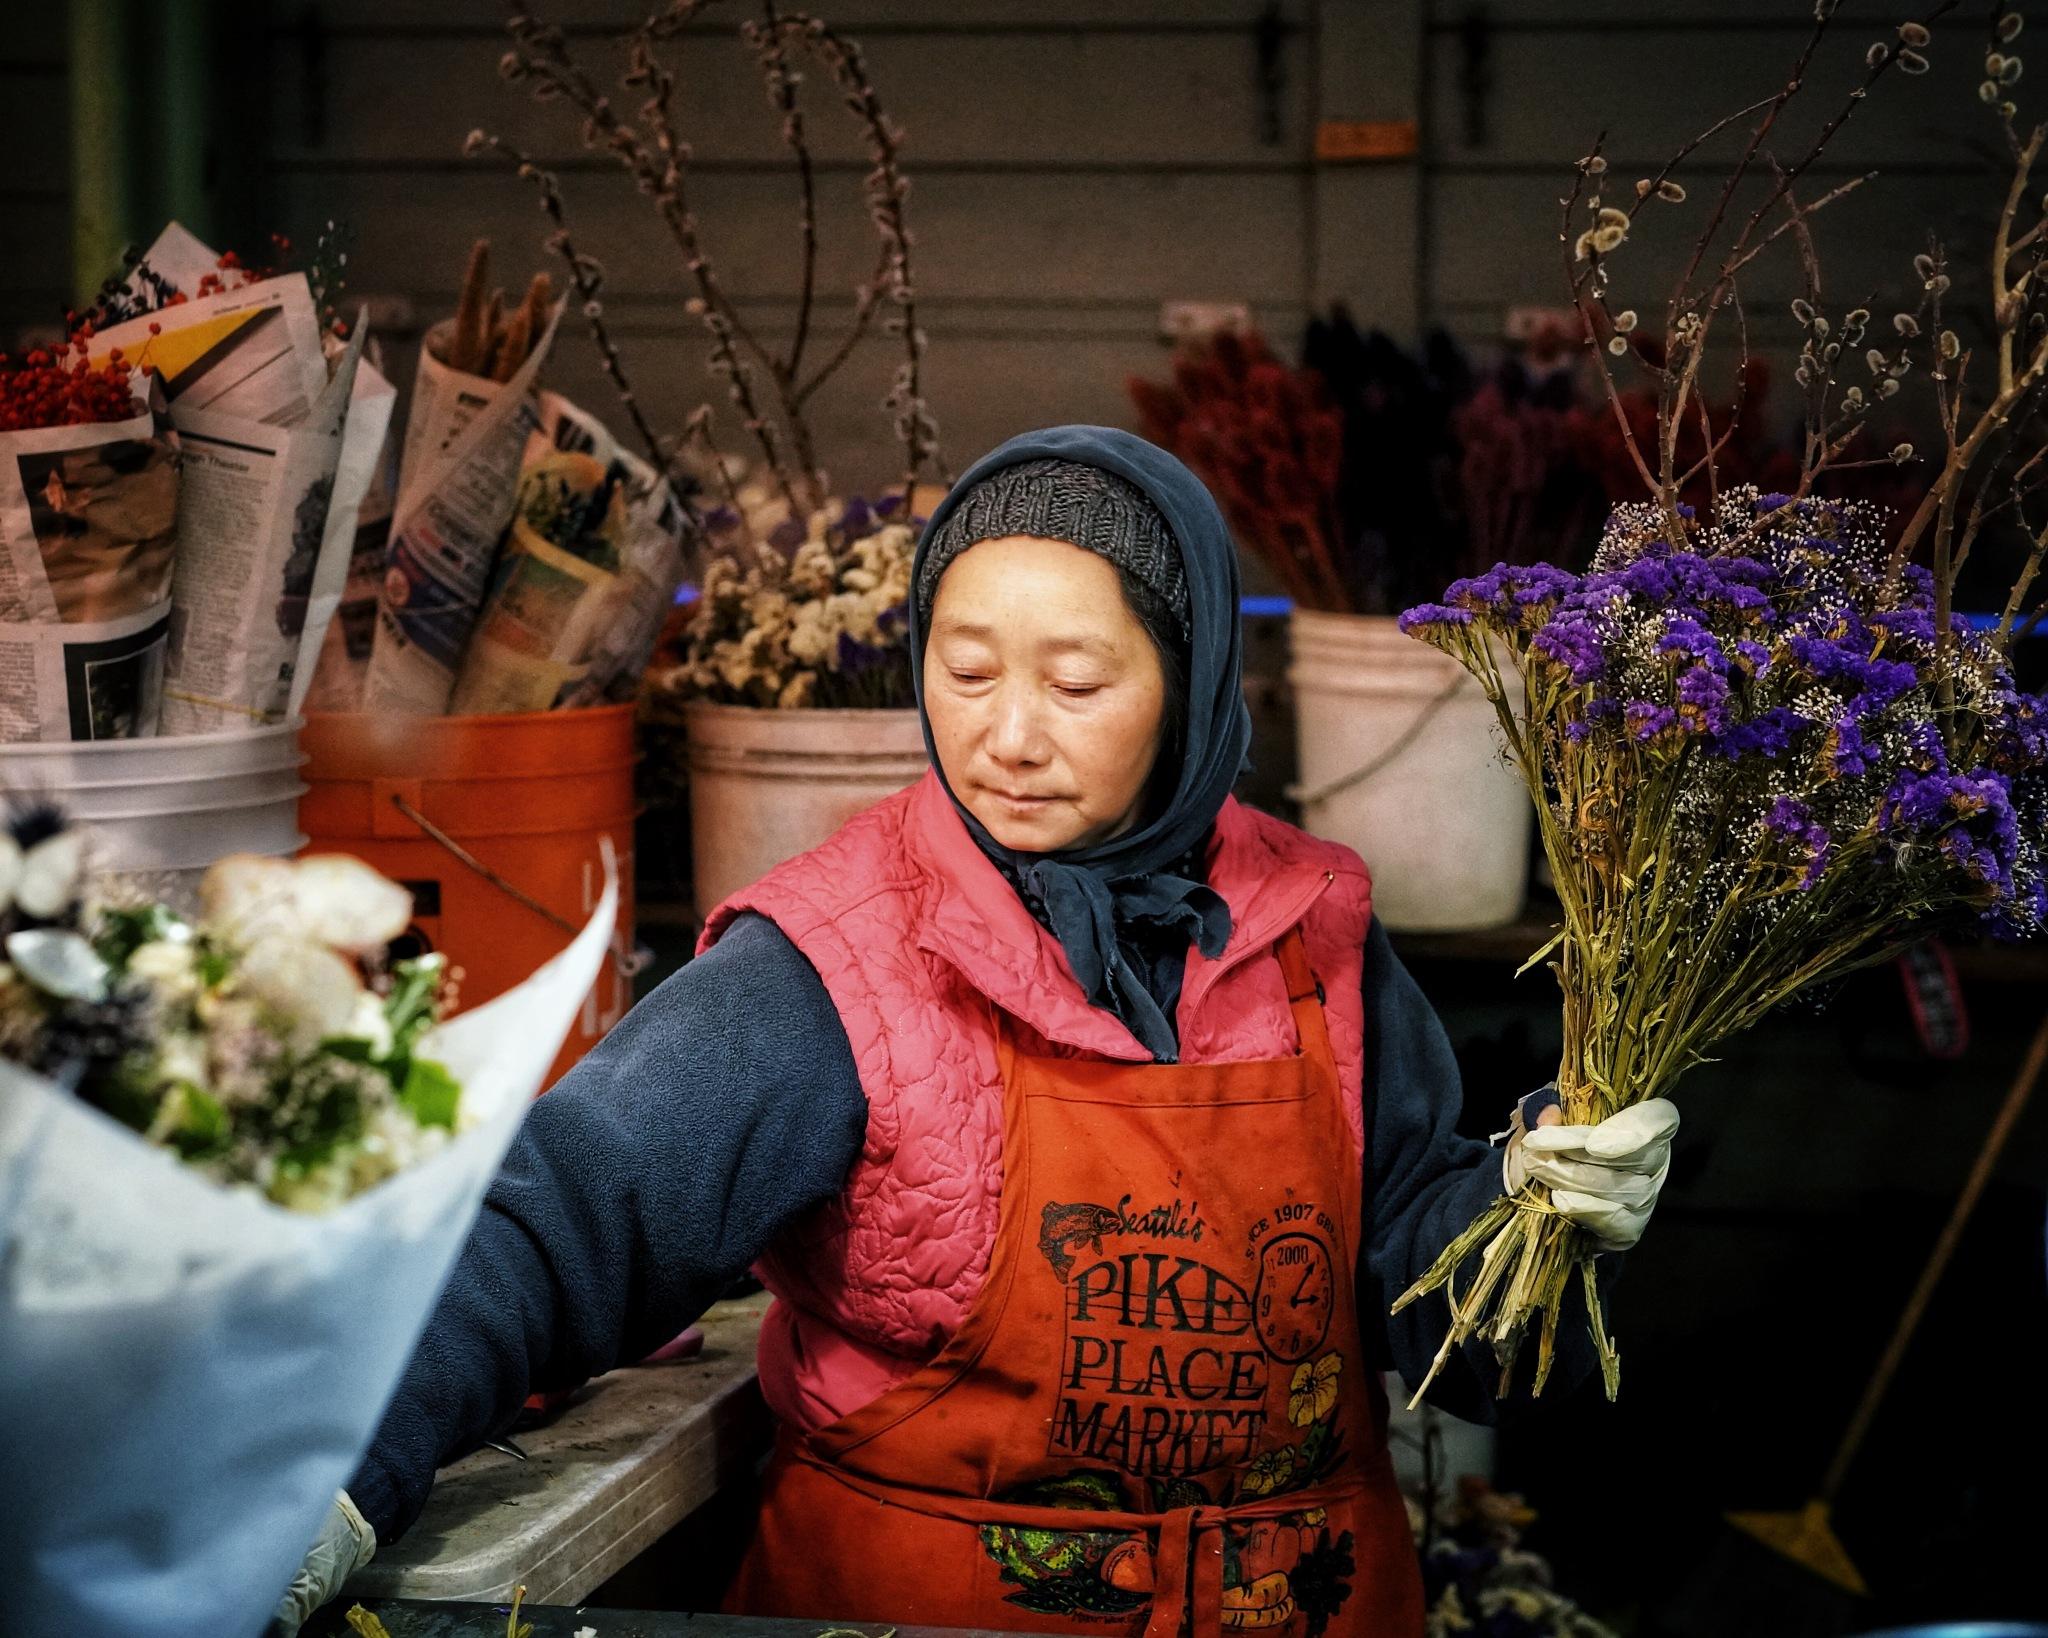 Flower lady by James Wilkinson